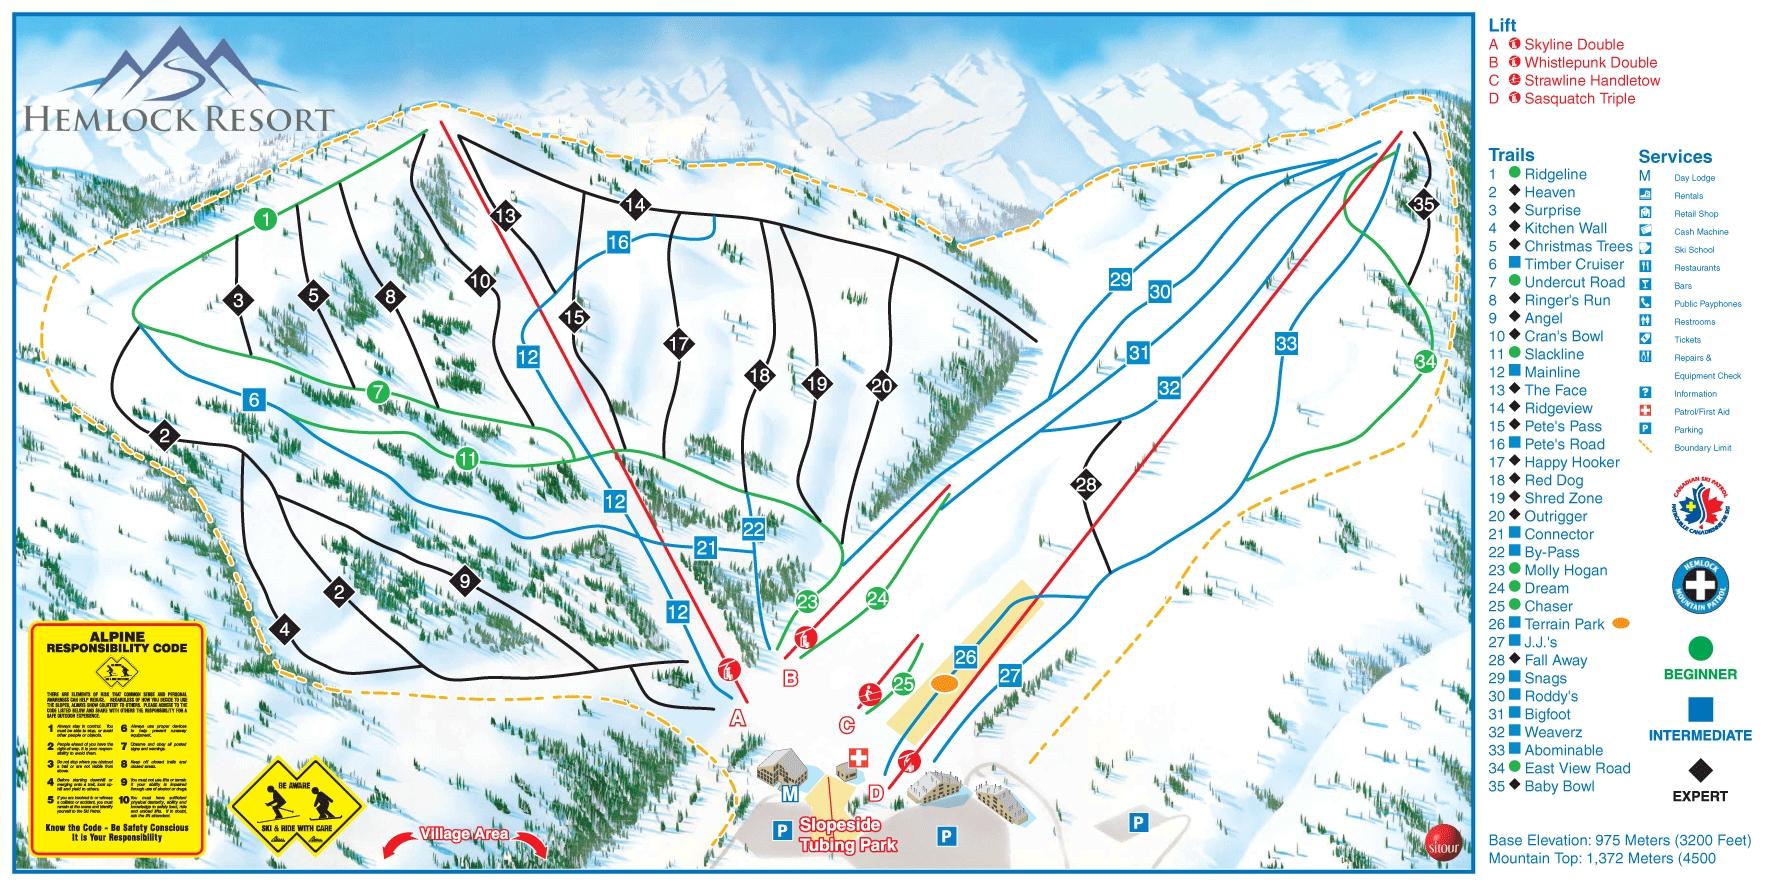 Sasquatch Mountain Resort Ski Resort Guide Location Map - Portugal map resorts